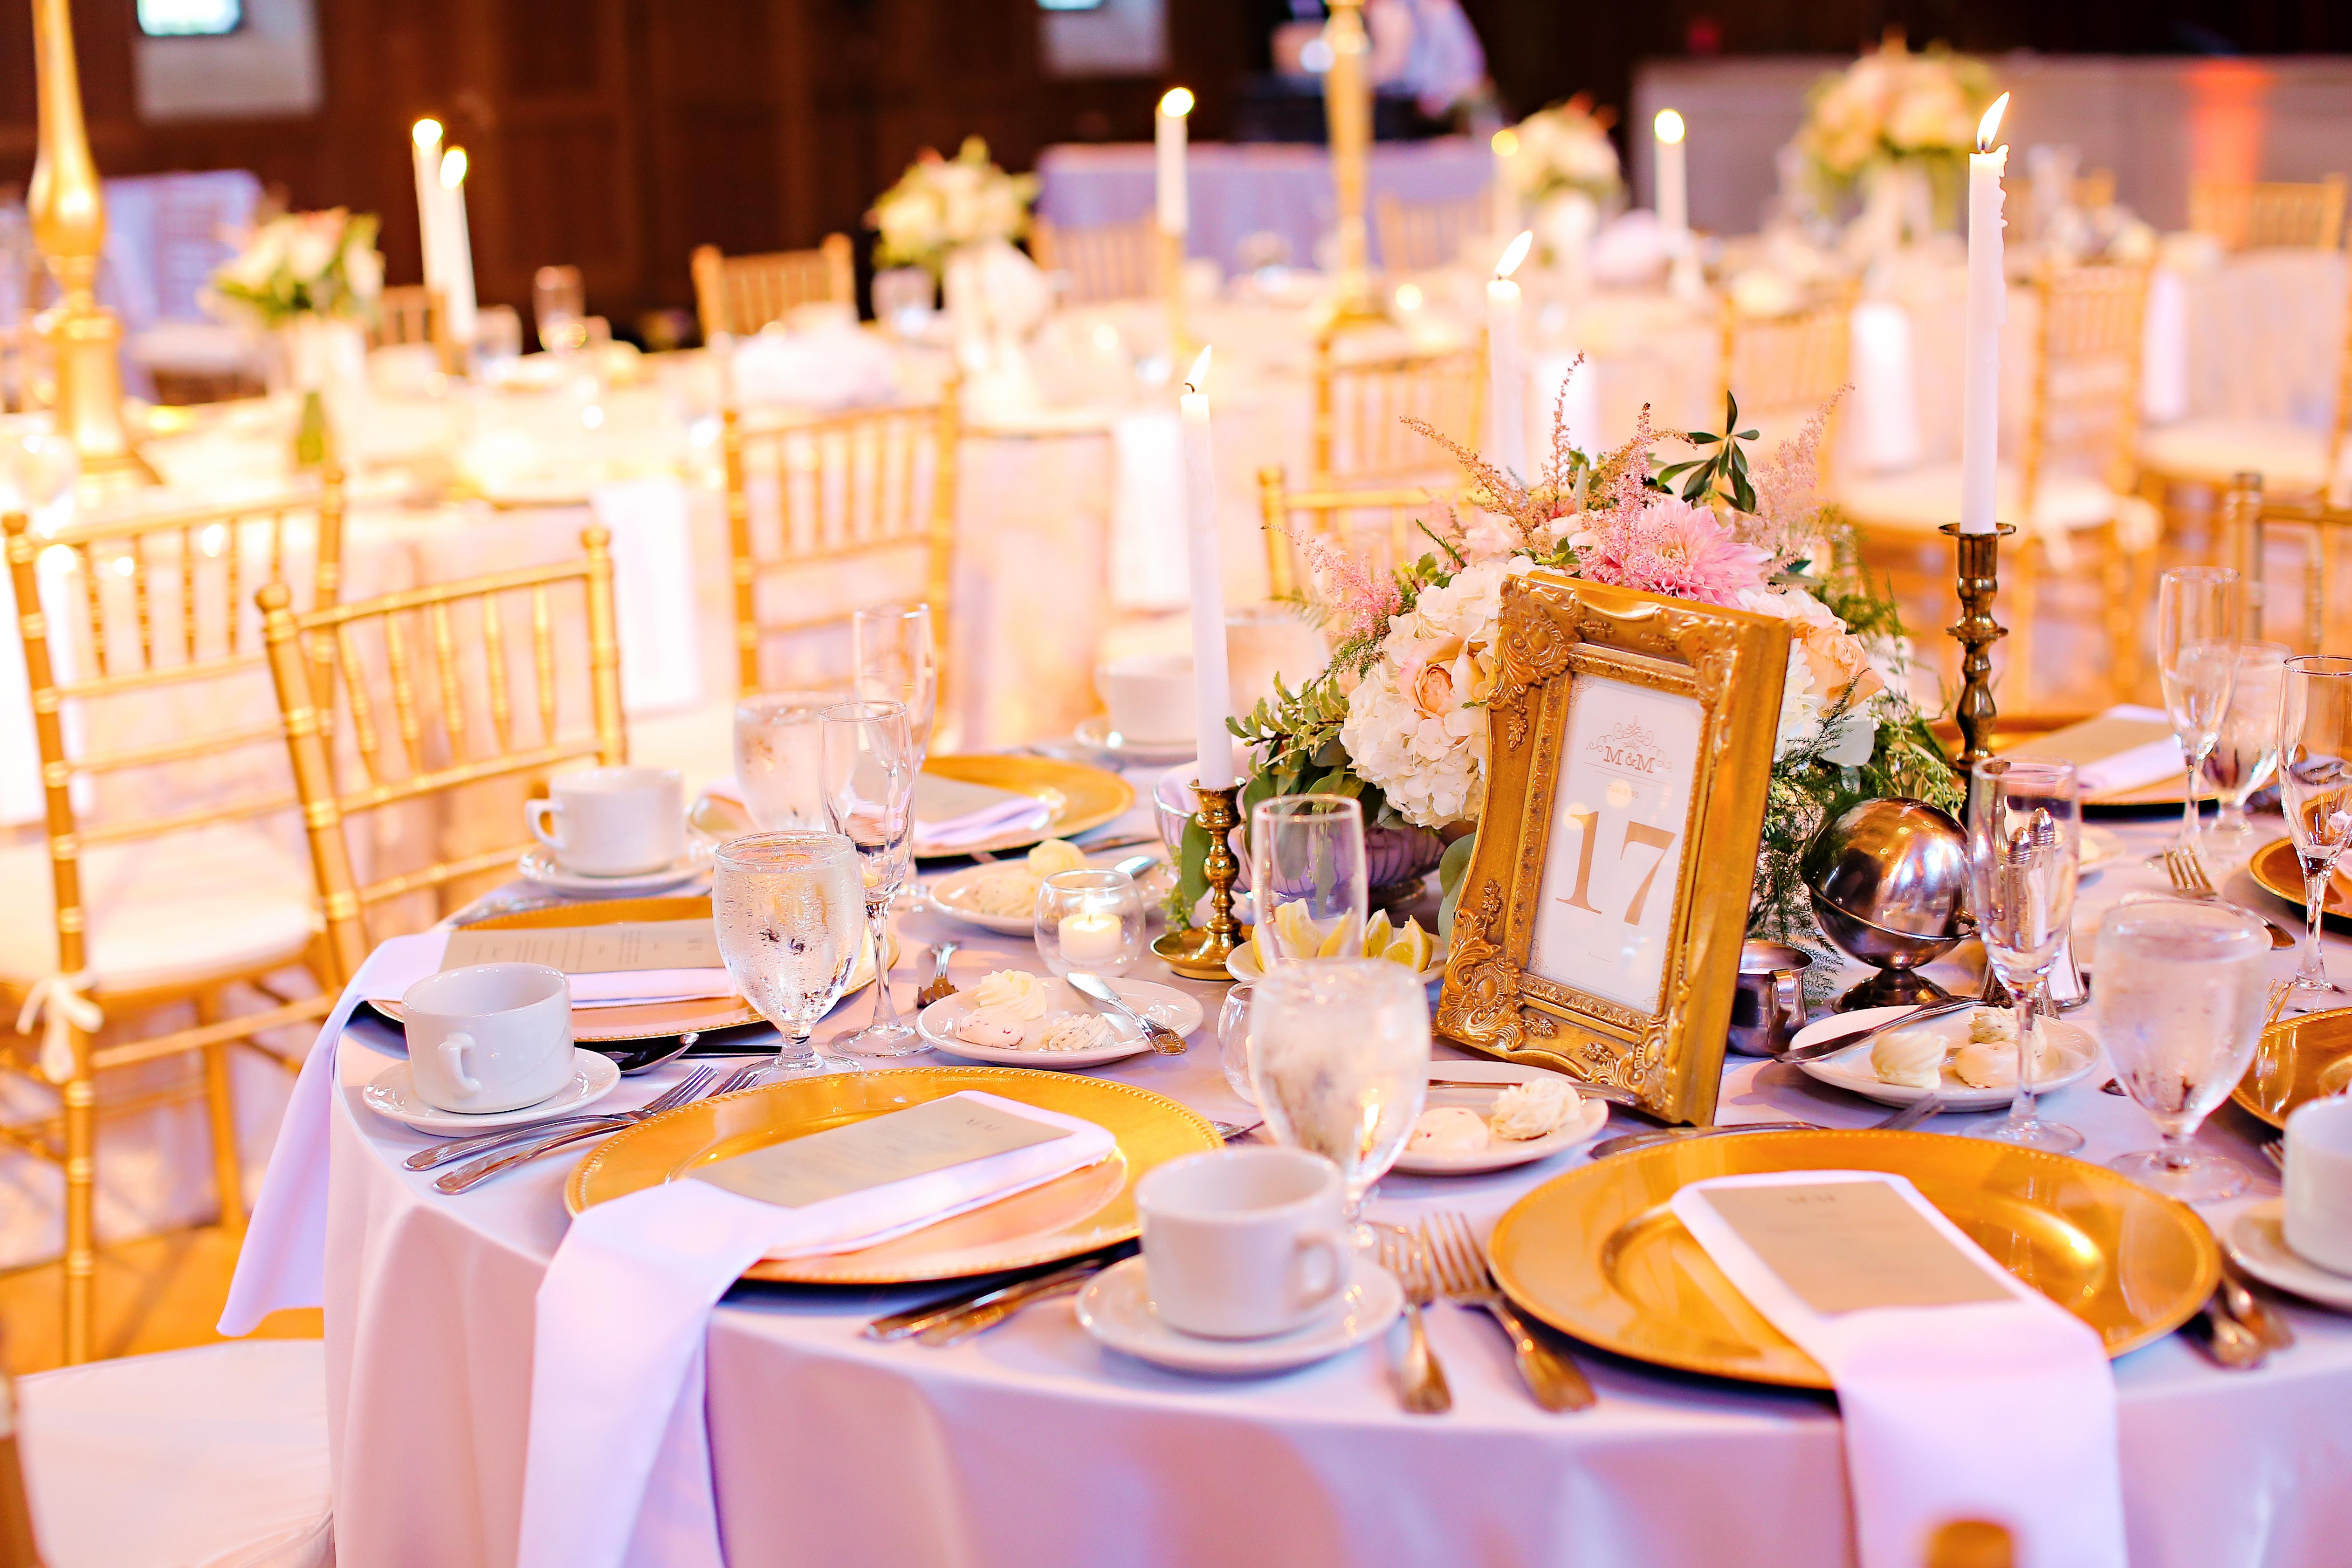 239 meaghan matt indiana university wedding